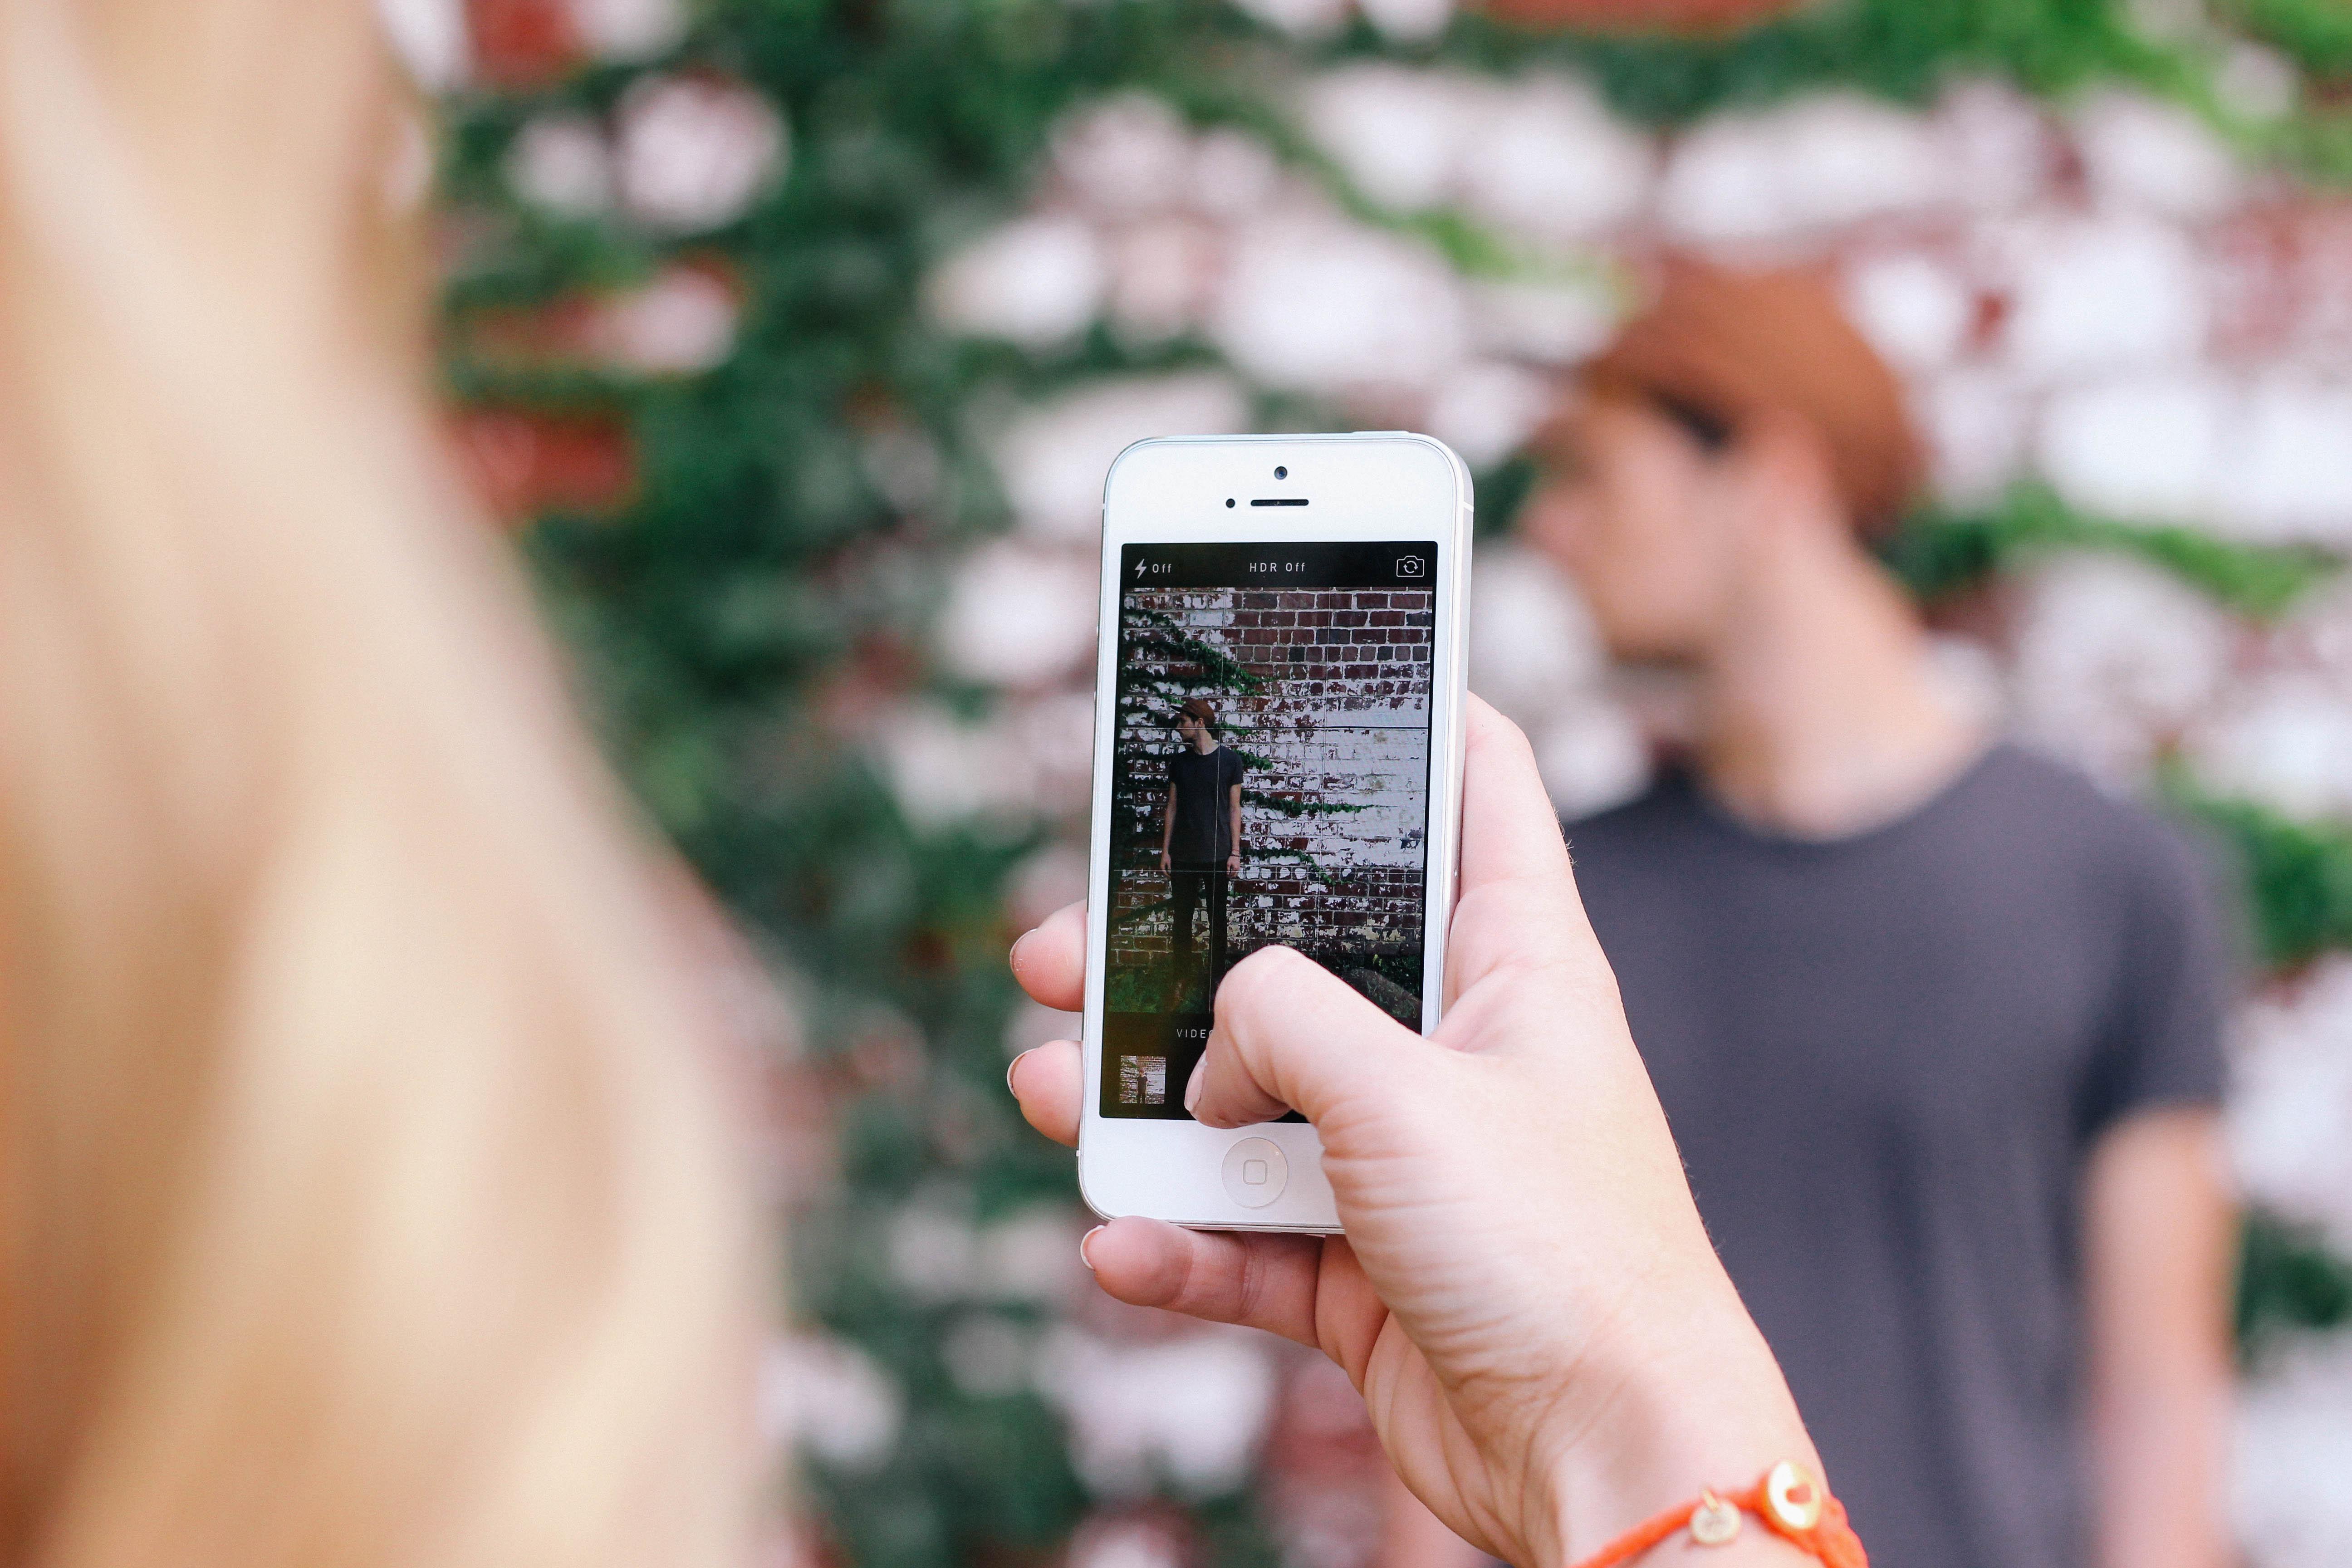 marketing to millennials, marketing gardening, millenial marketing guide, garden media group, taking a picture with phone, digital marketing